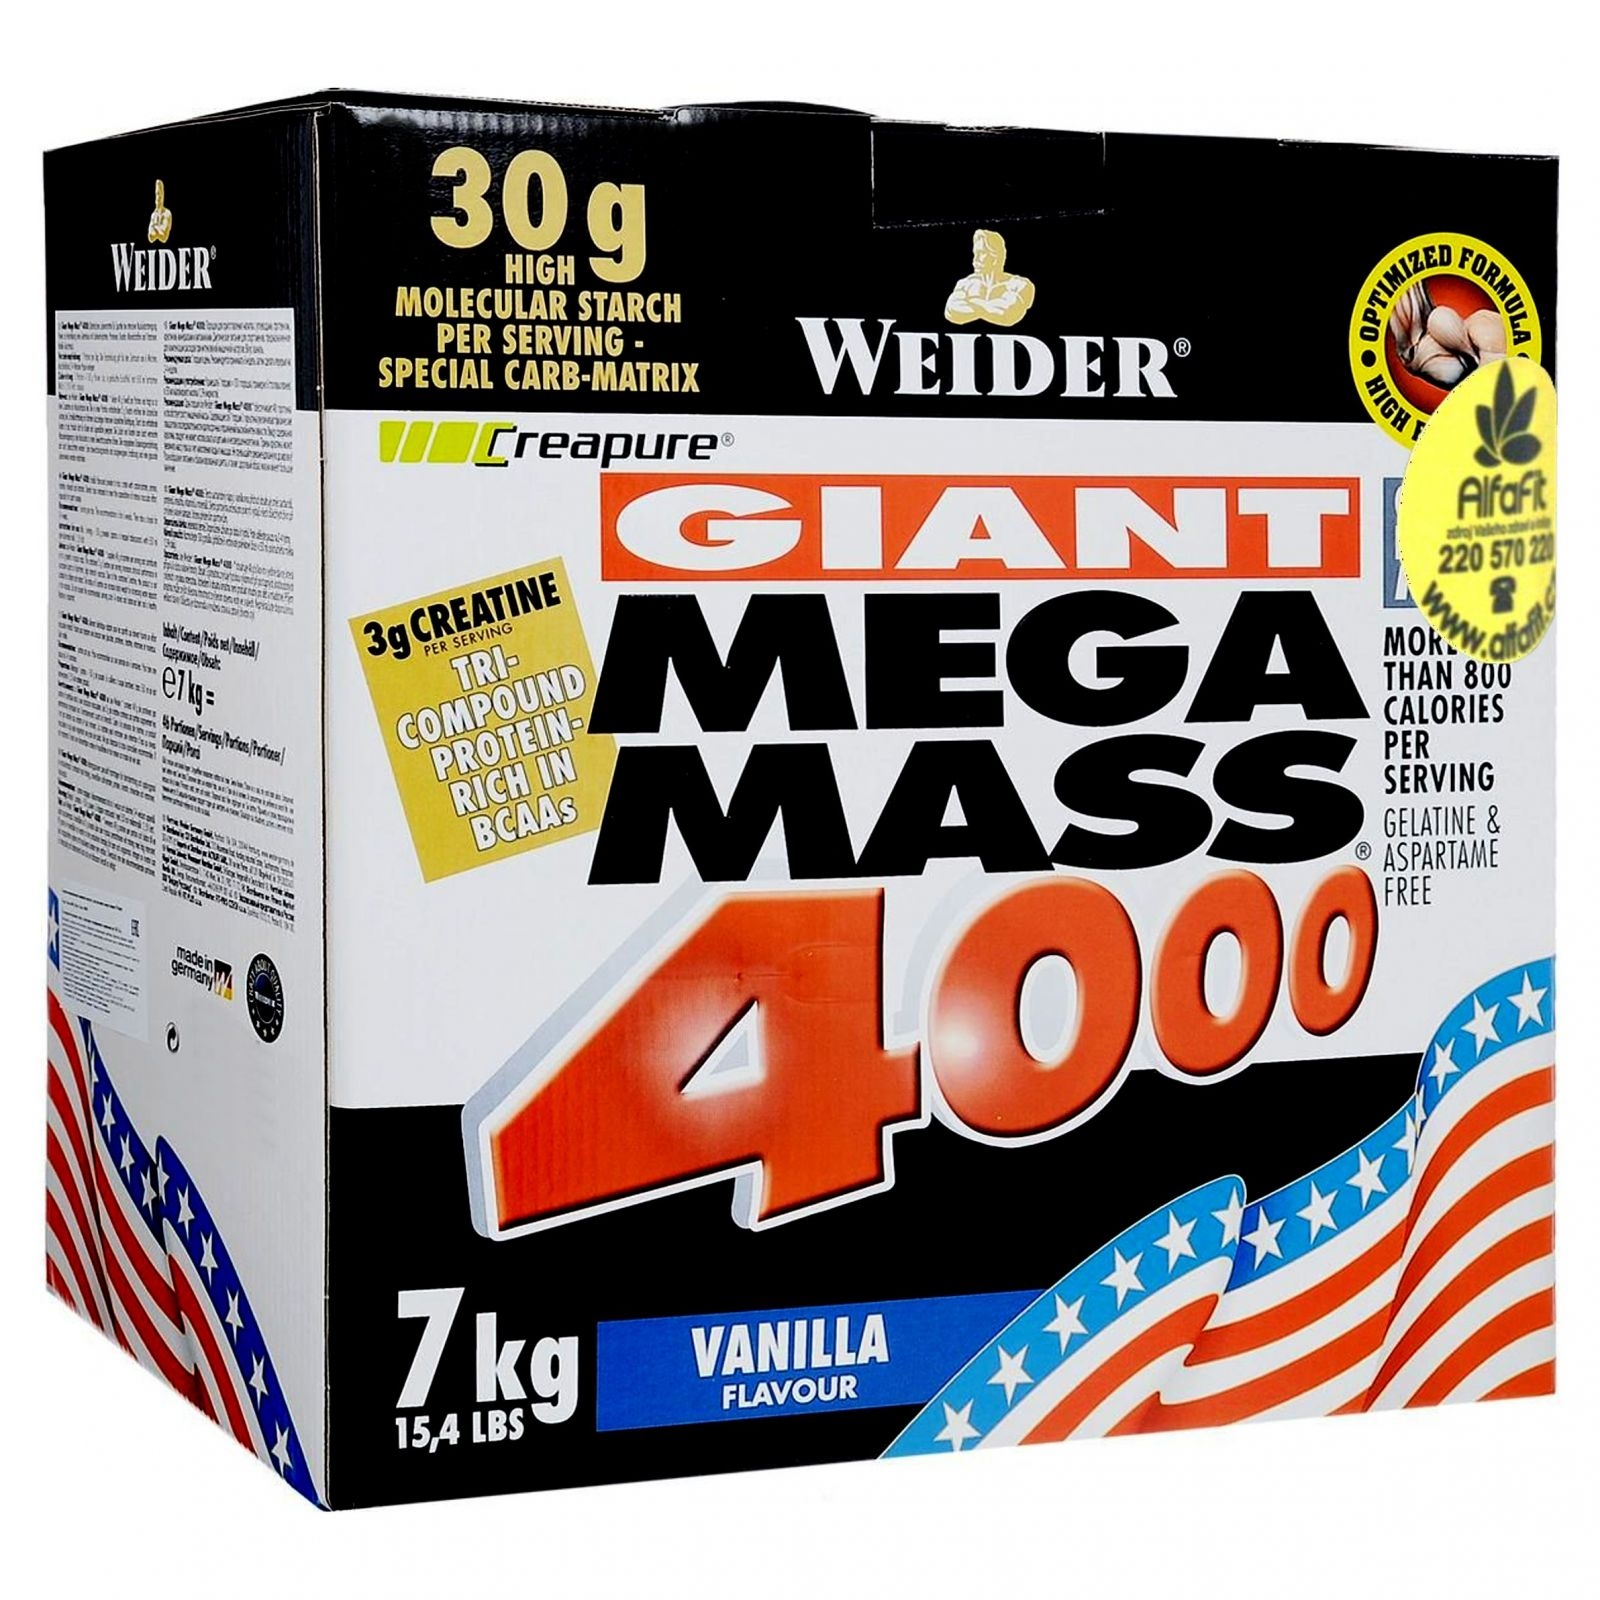 Weider Giant Mega Mass 4000 - 7 kg